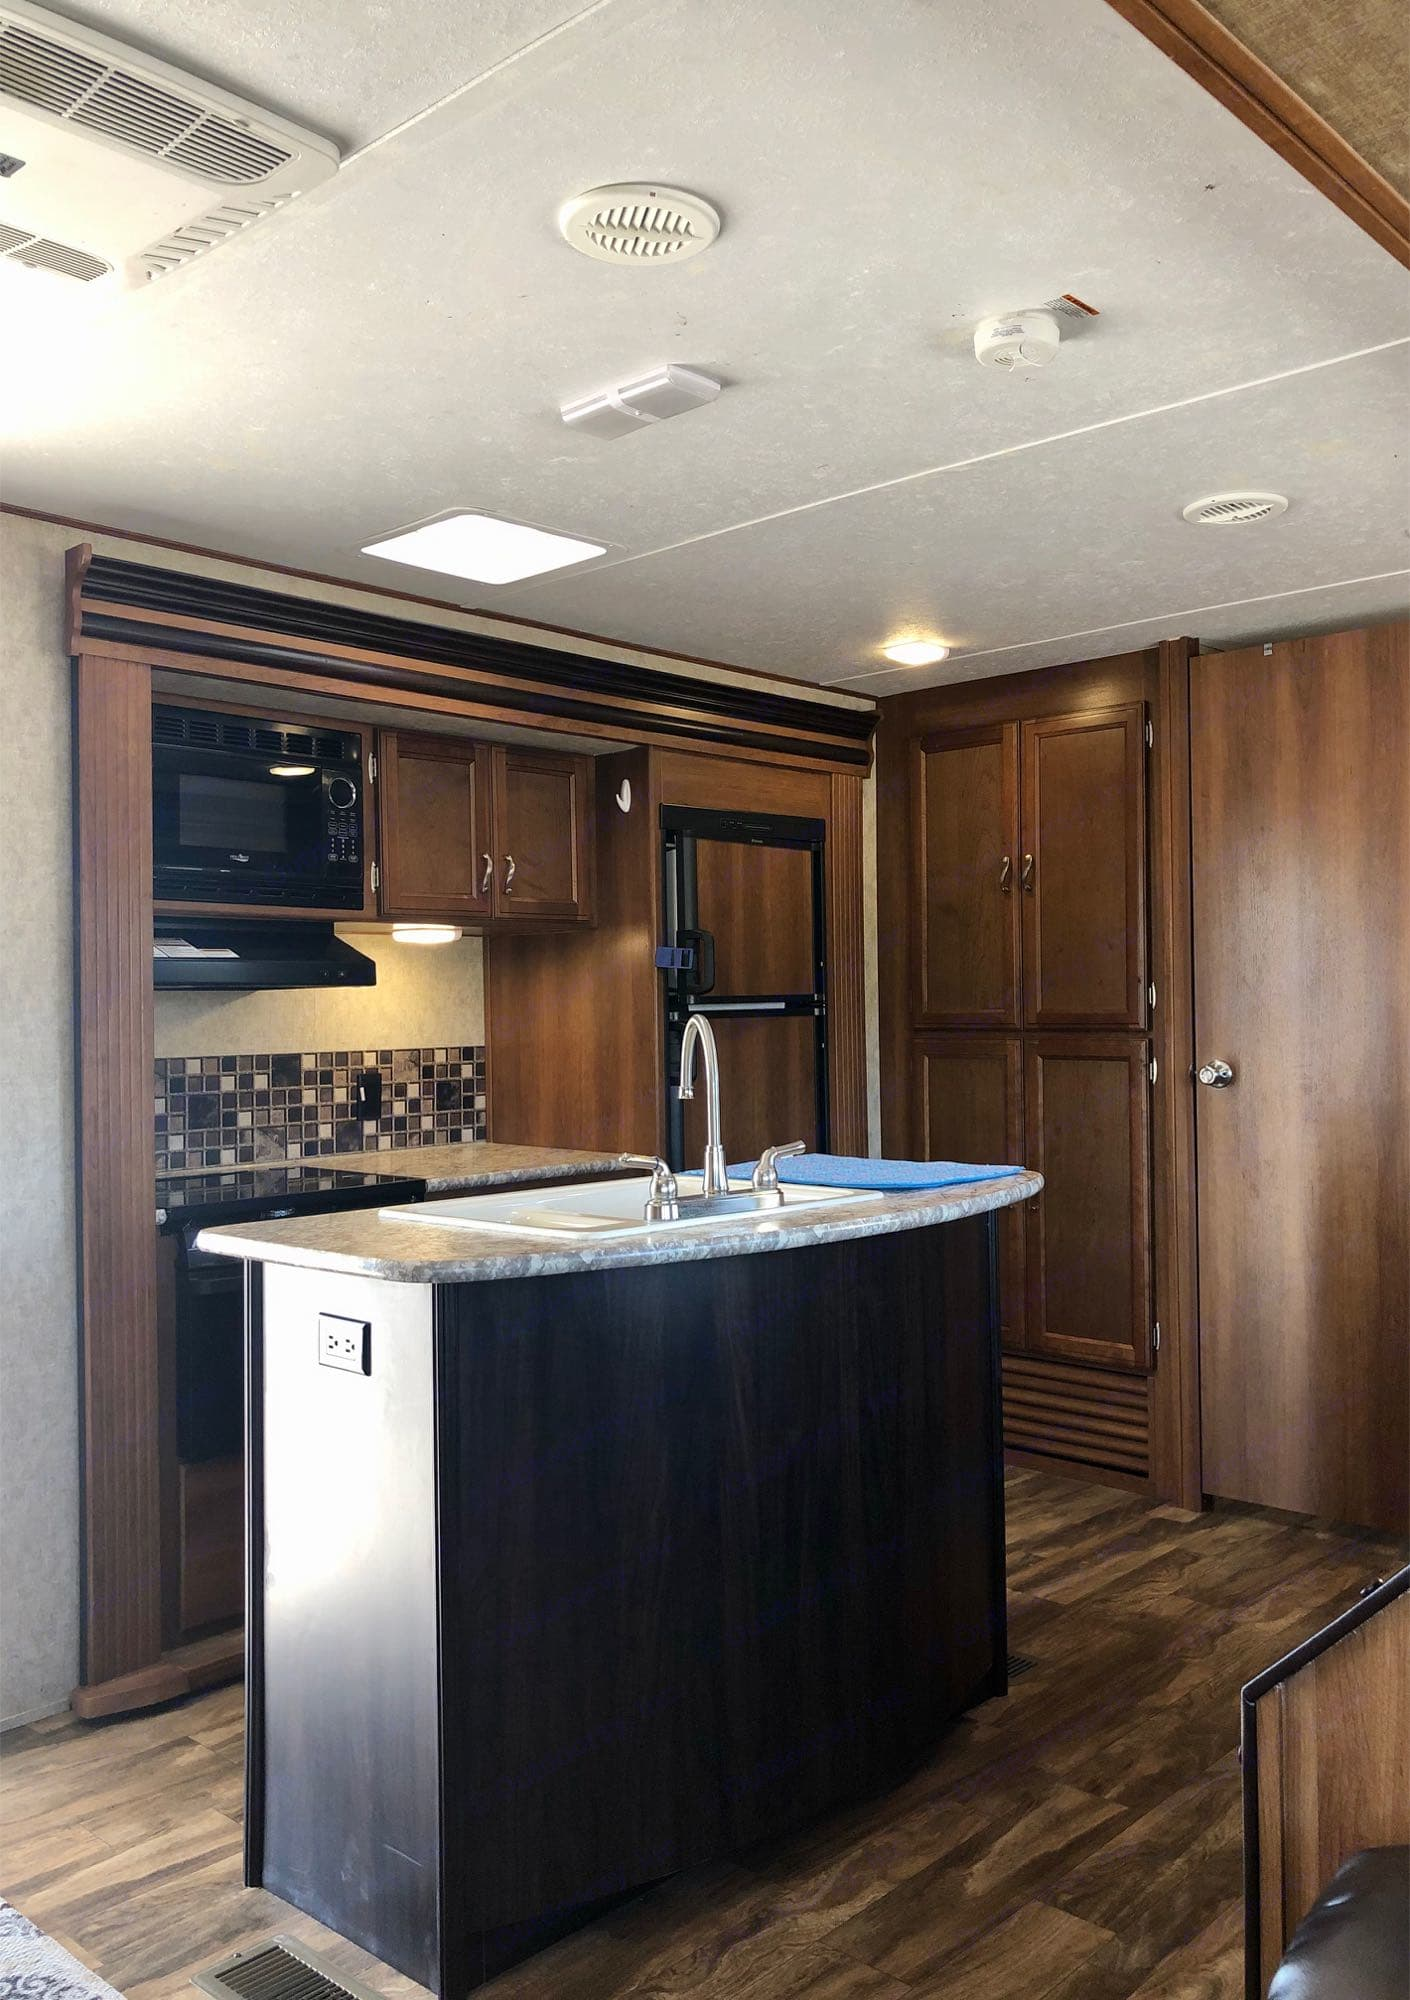 Interior kitchen w/ island& slide-out. Prime Time Avenger 2016